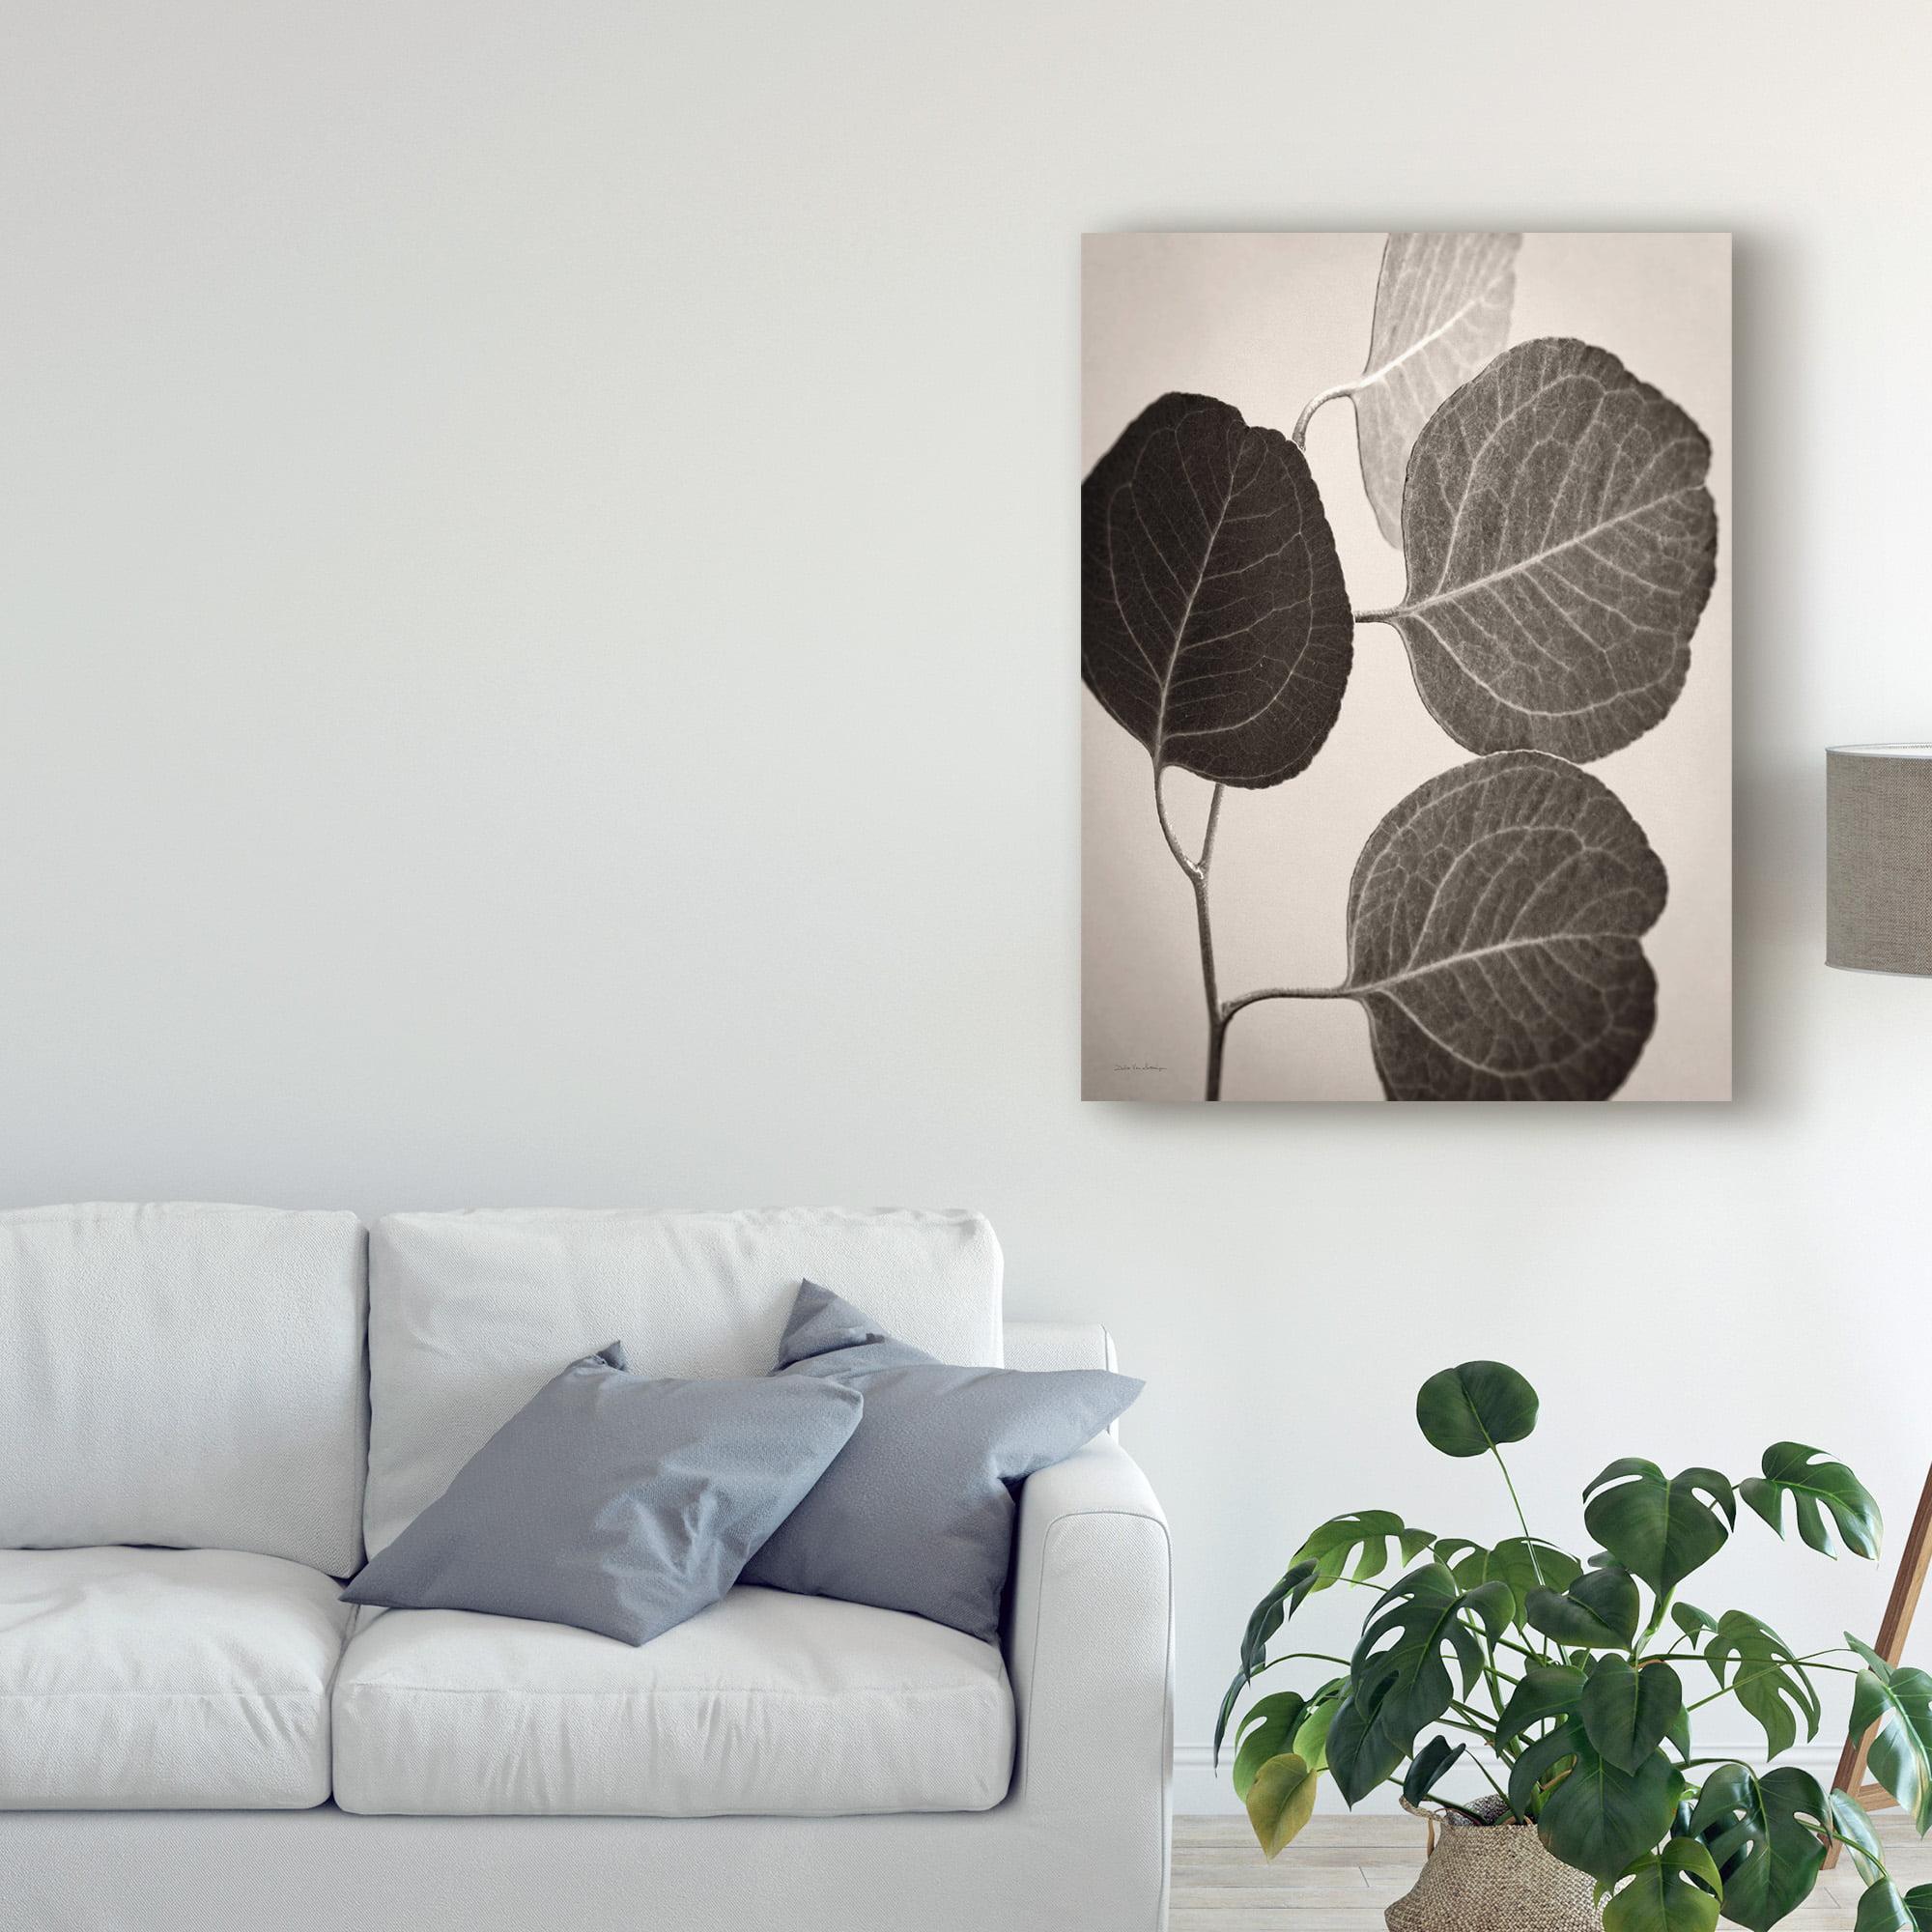 Global Gallery Debra Van Swearingen Aspens II Giclee Stretched Canvas Artwork 20 x 30